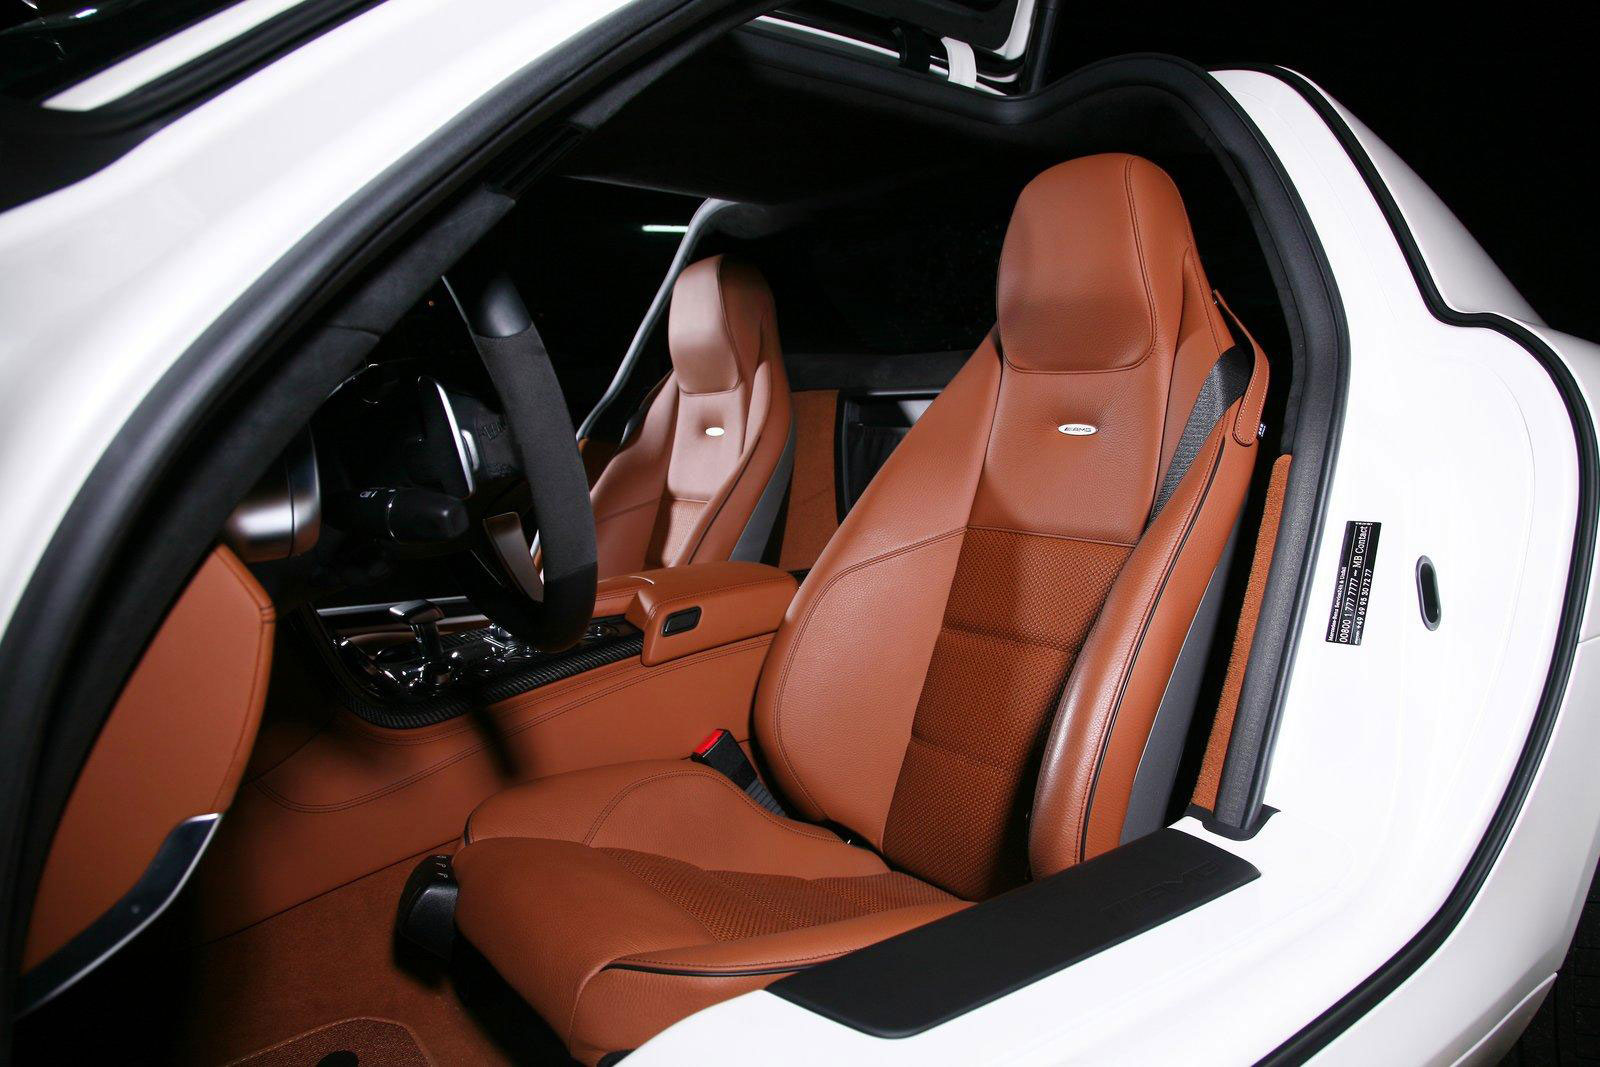 Mercedes-Benz SLS AMG dostal od Inden Design pár koní navíc 7